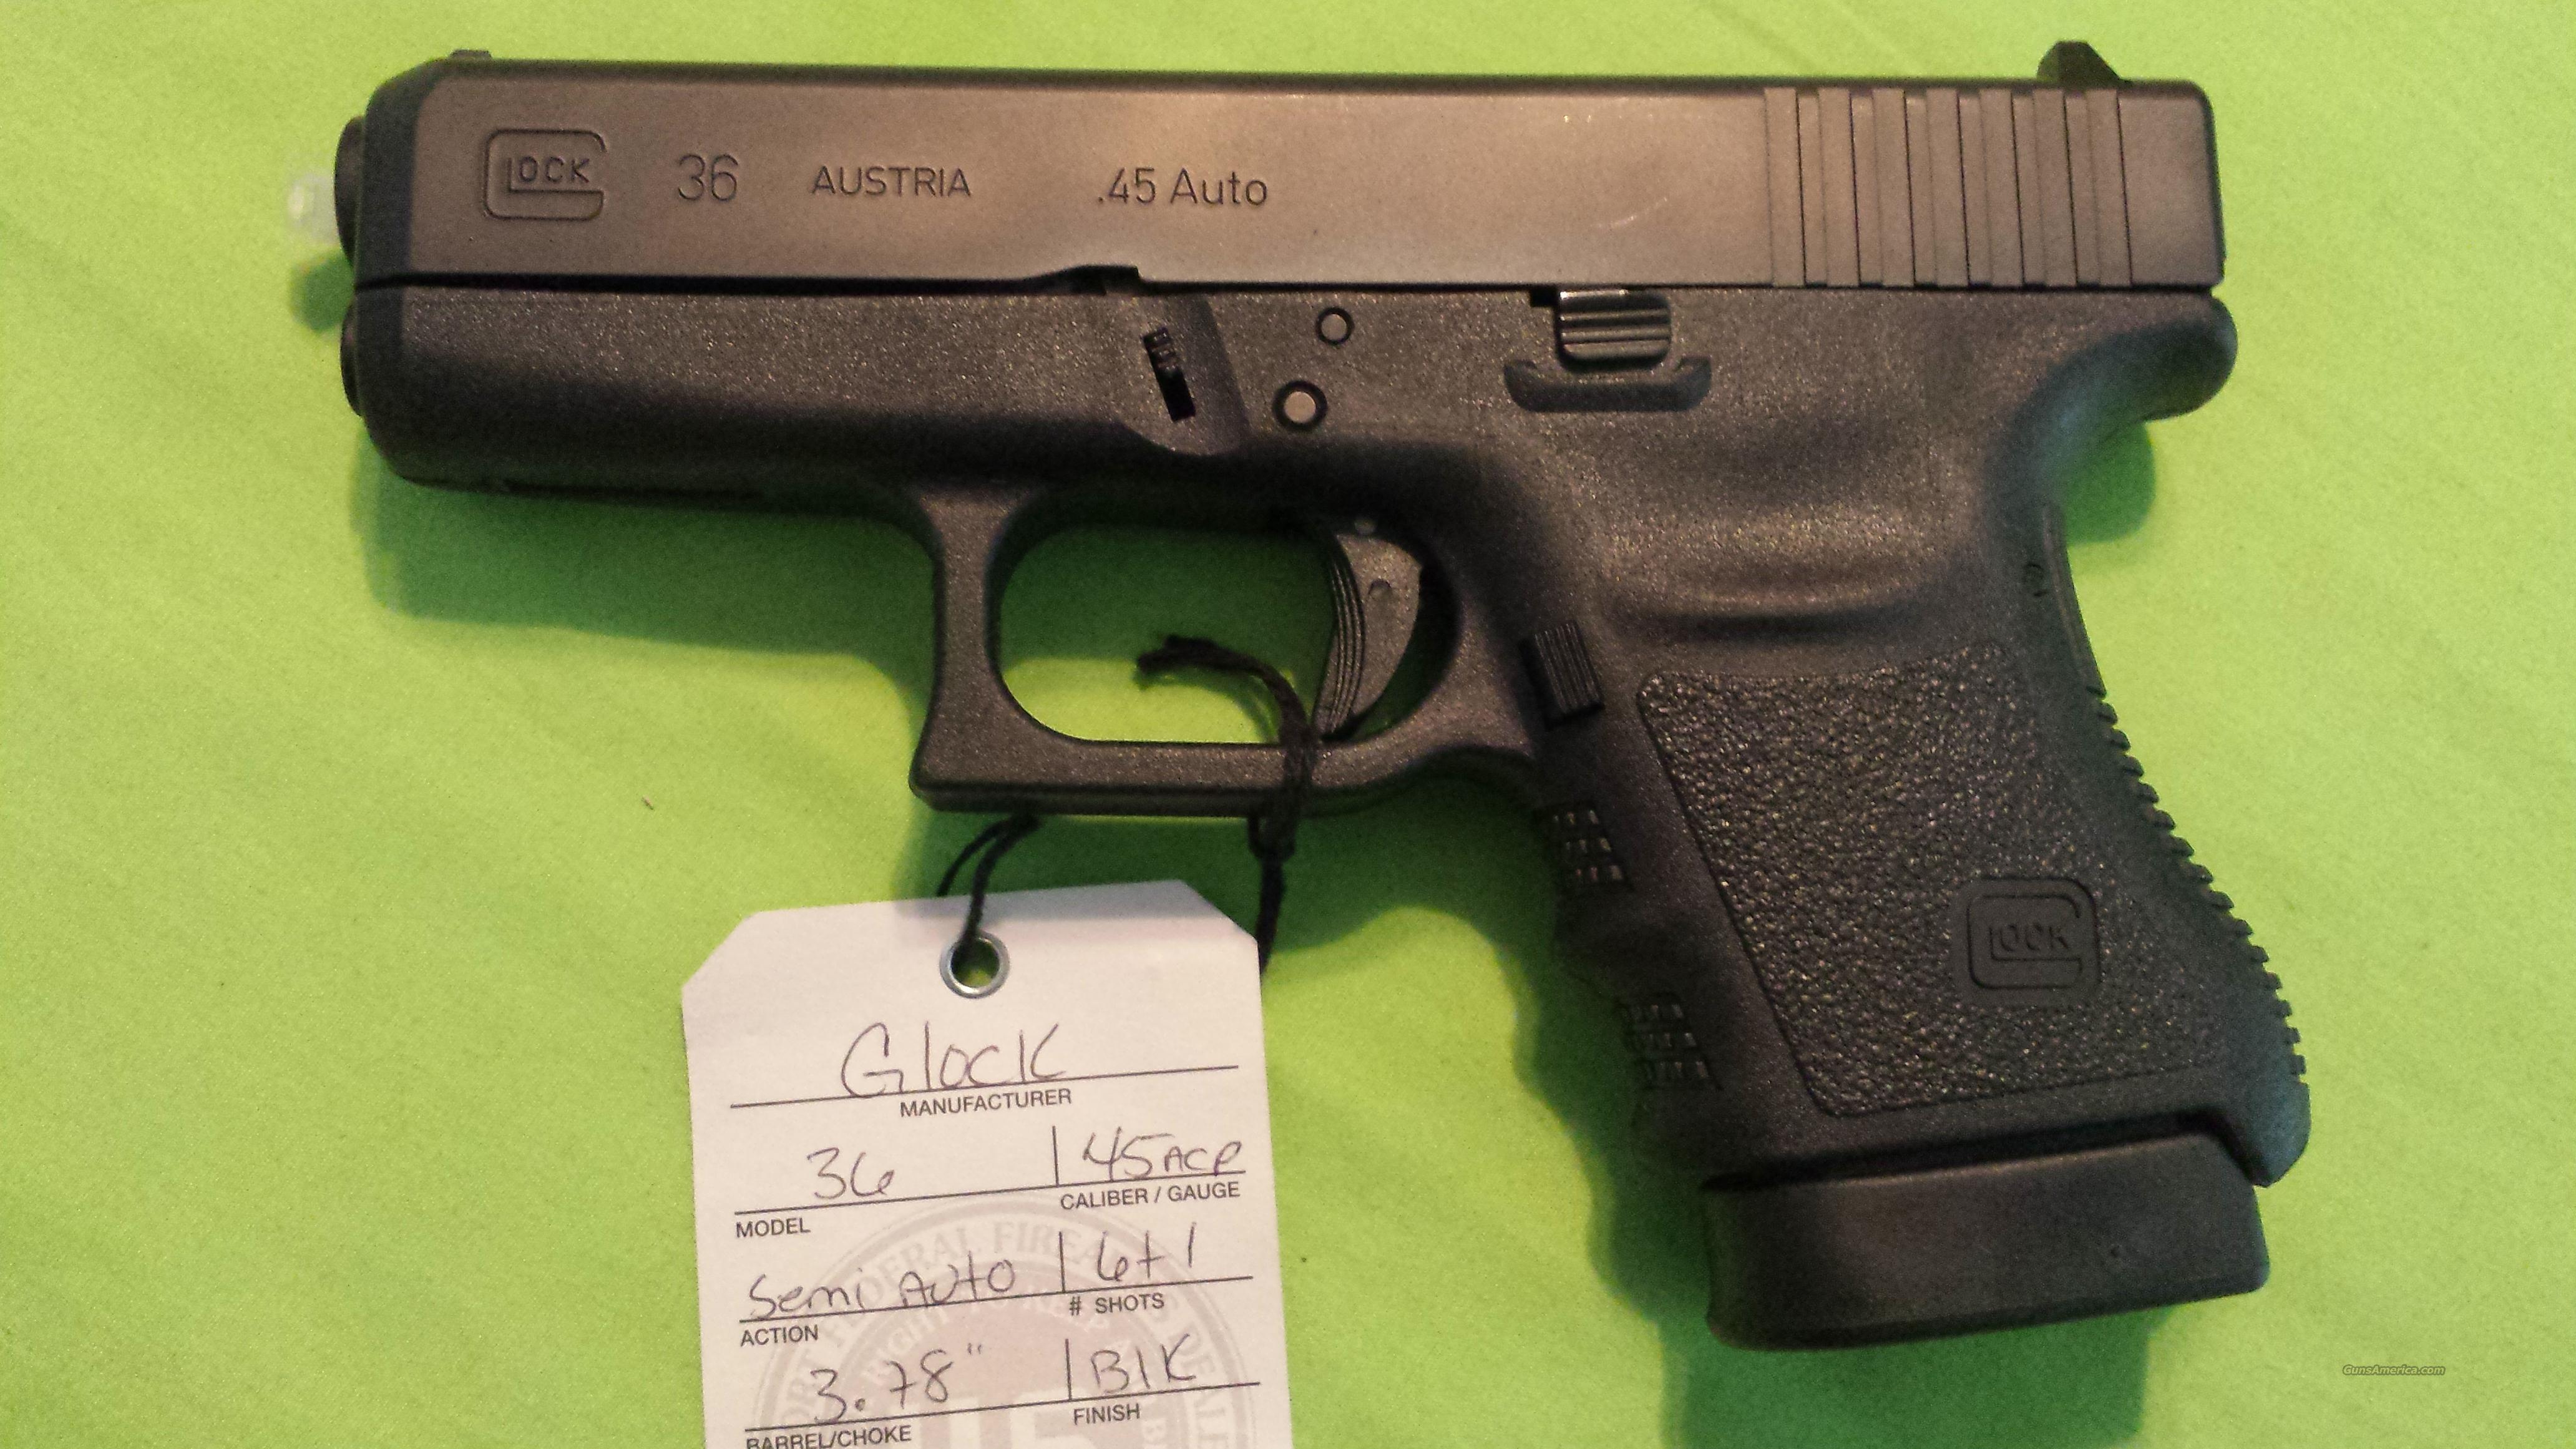 GLOCK 36 GEN 3 45ACP .45 SUB COMPACT 6RD SLIM  Guns > Pistols > Glock Pistols > 29/30/36